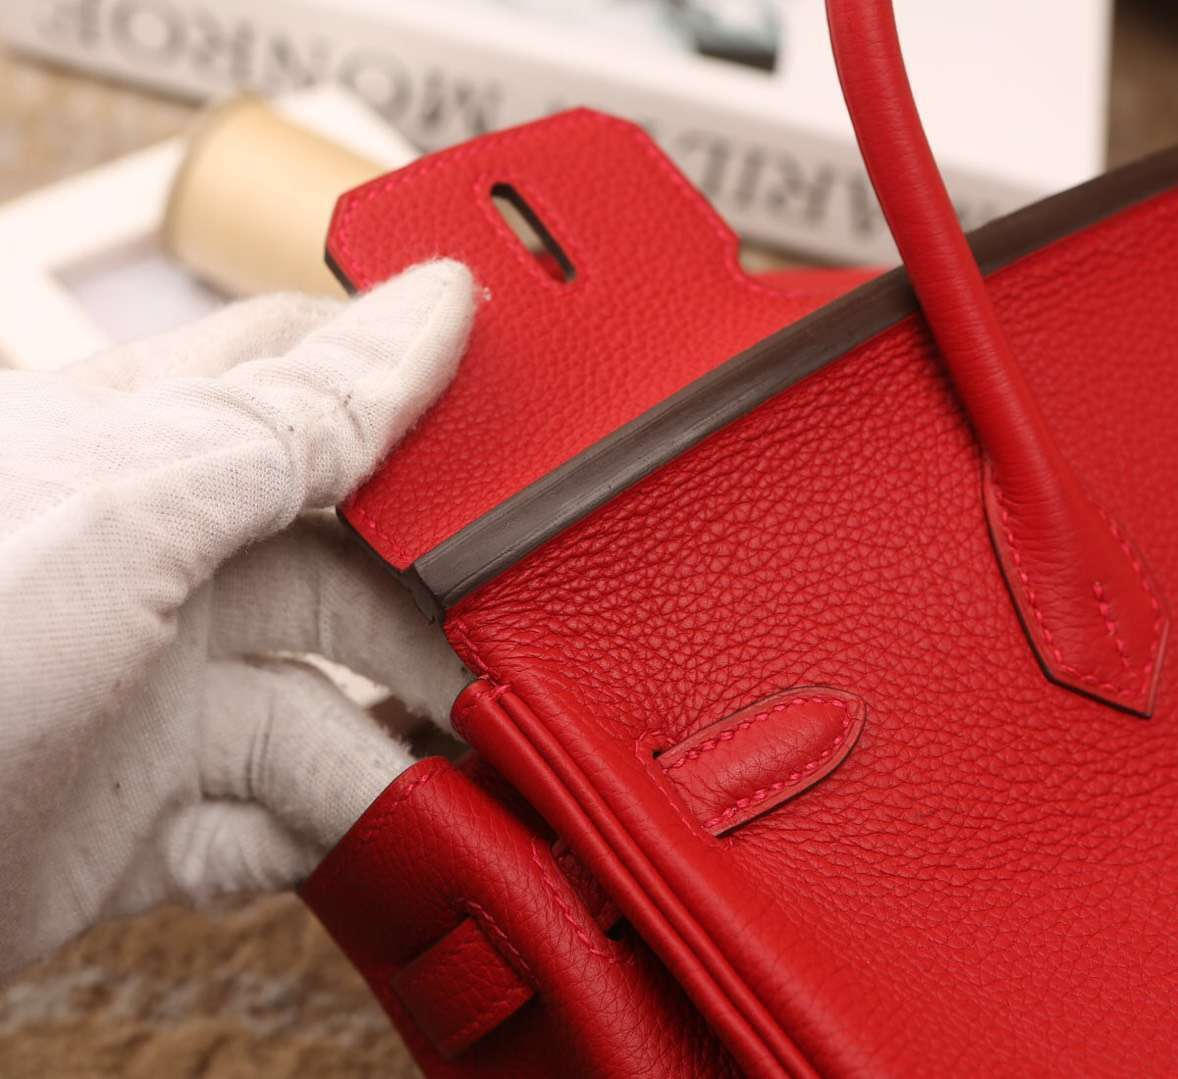 Hermes爱马仕 Birkin 25 Q5 中国红 原厂御用顶级小牛皮 银扣 现货